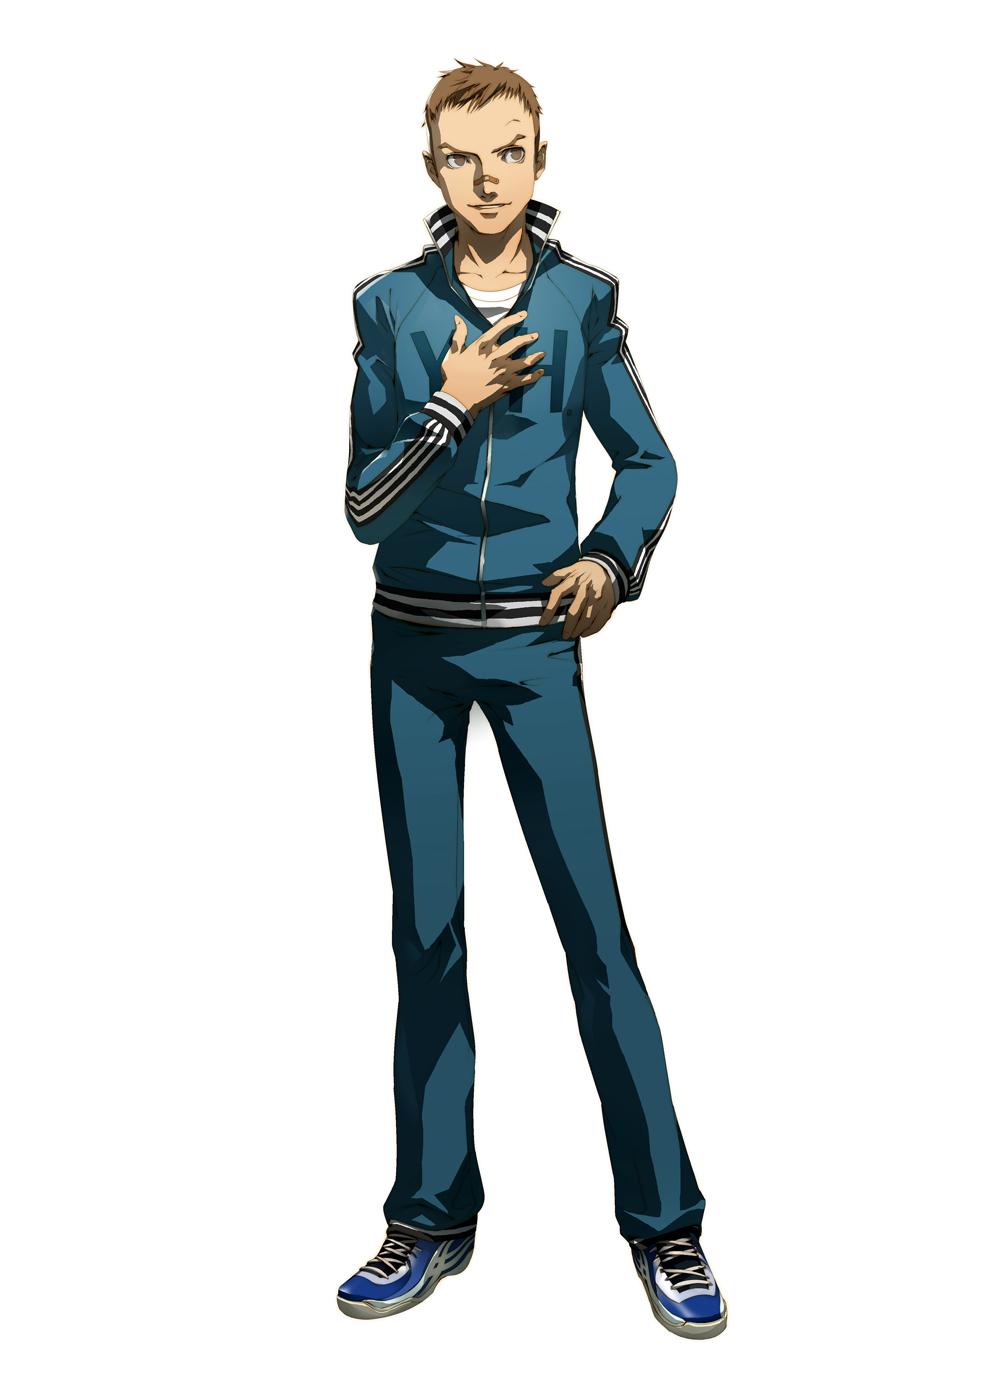 bandage brown_eyes brown_hair highres jacket male nagase_daisuke official_art persona persona_4 shigenori_soejima short_hair smile soejima_shigenori track_jacket